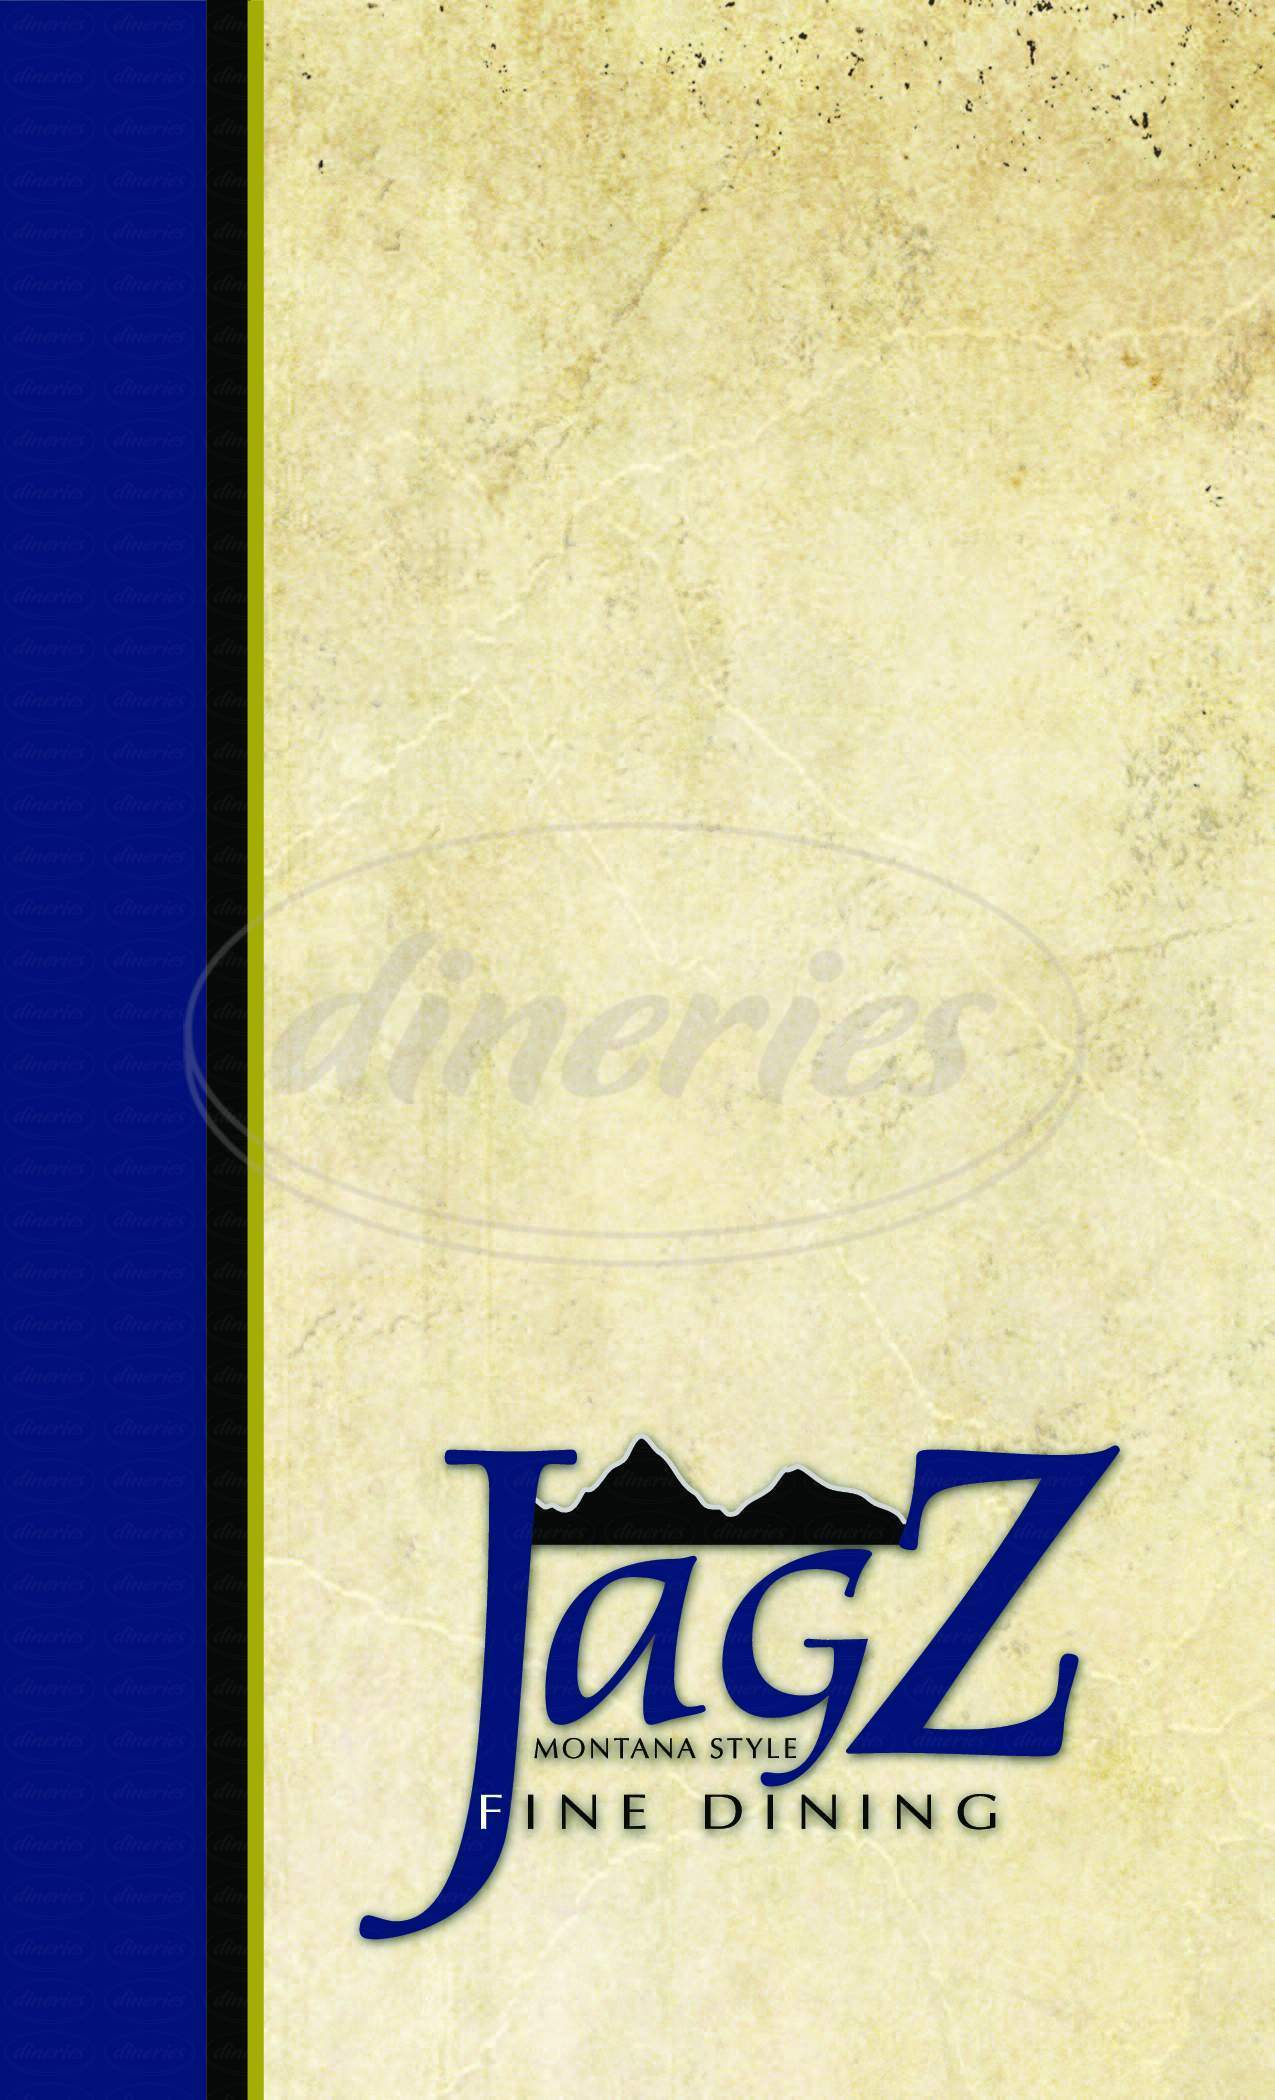 menu for Jagz